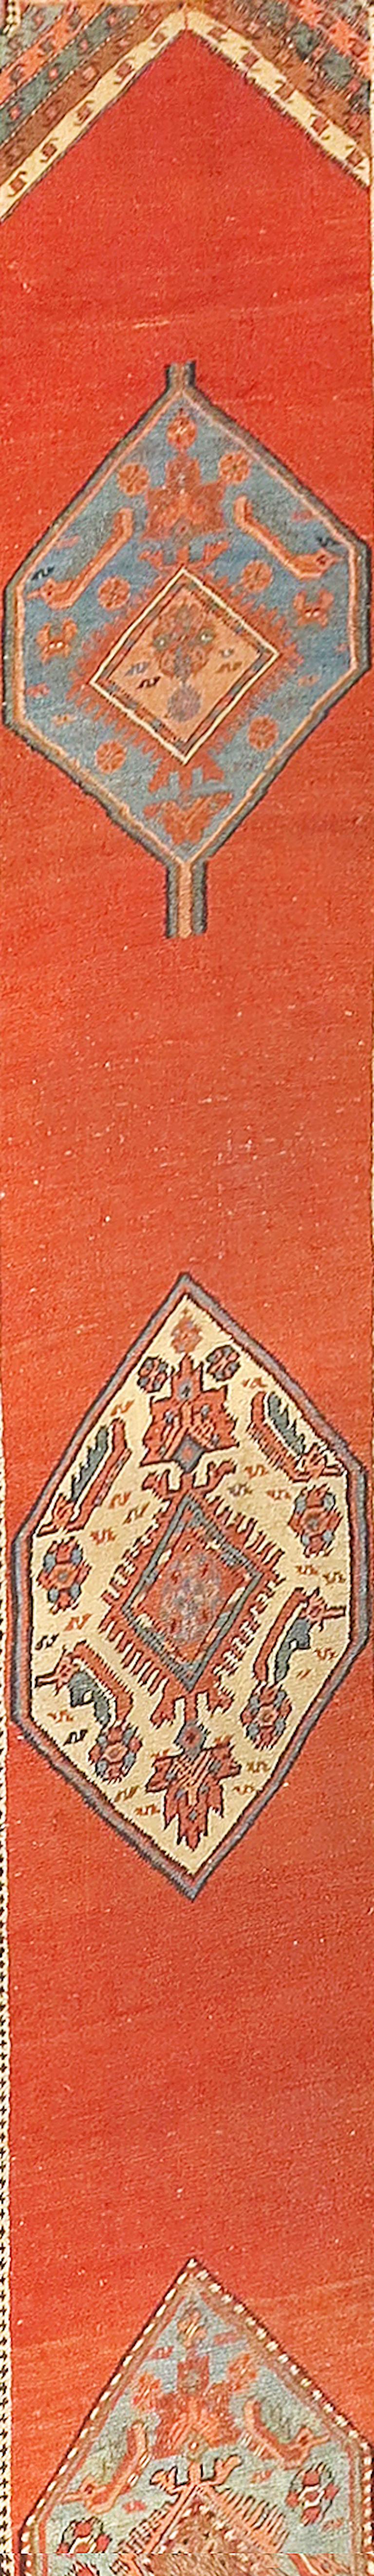 Bakshaish Fine Antique Persian Bakshayesh Runner Rug, Hand Knotted, circa 1890 For Sale